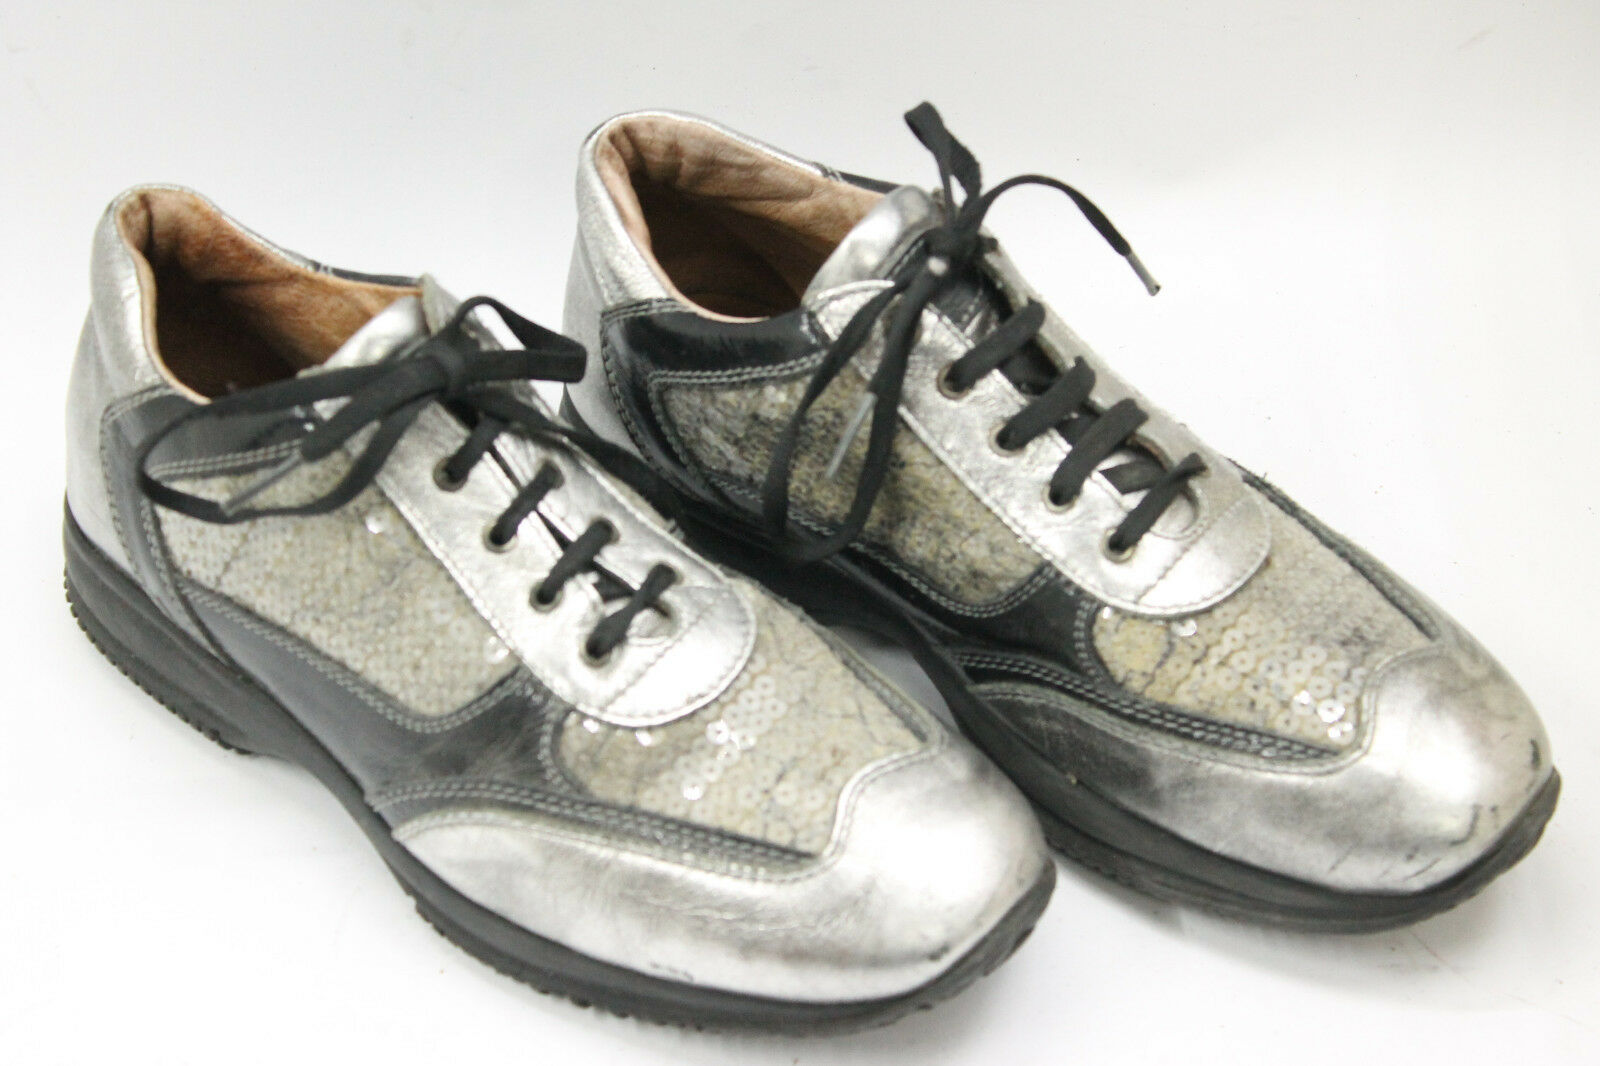 ALVIERO MARTINI women shoes sz 7.5 Europe 38 silver black leather S6797